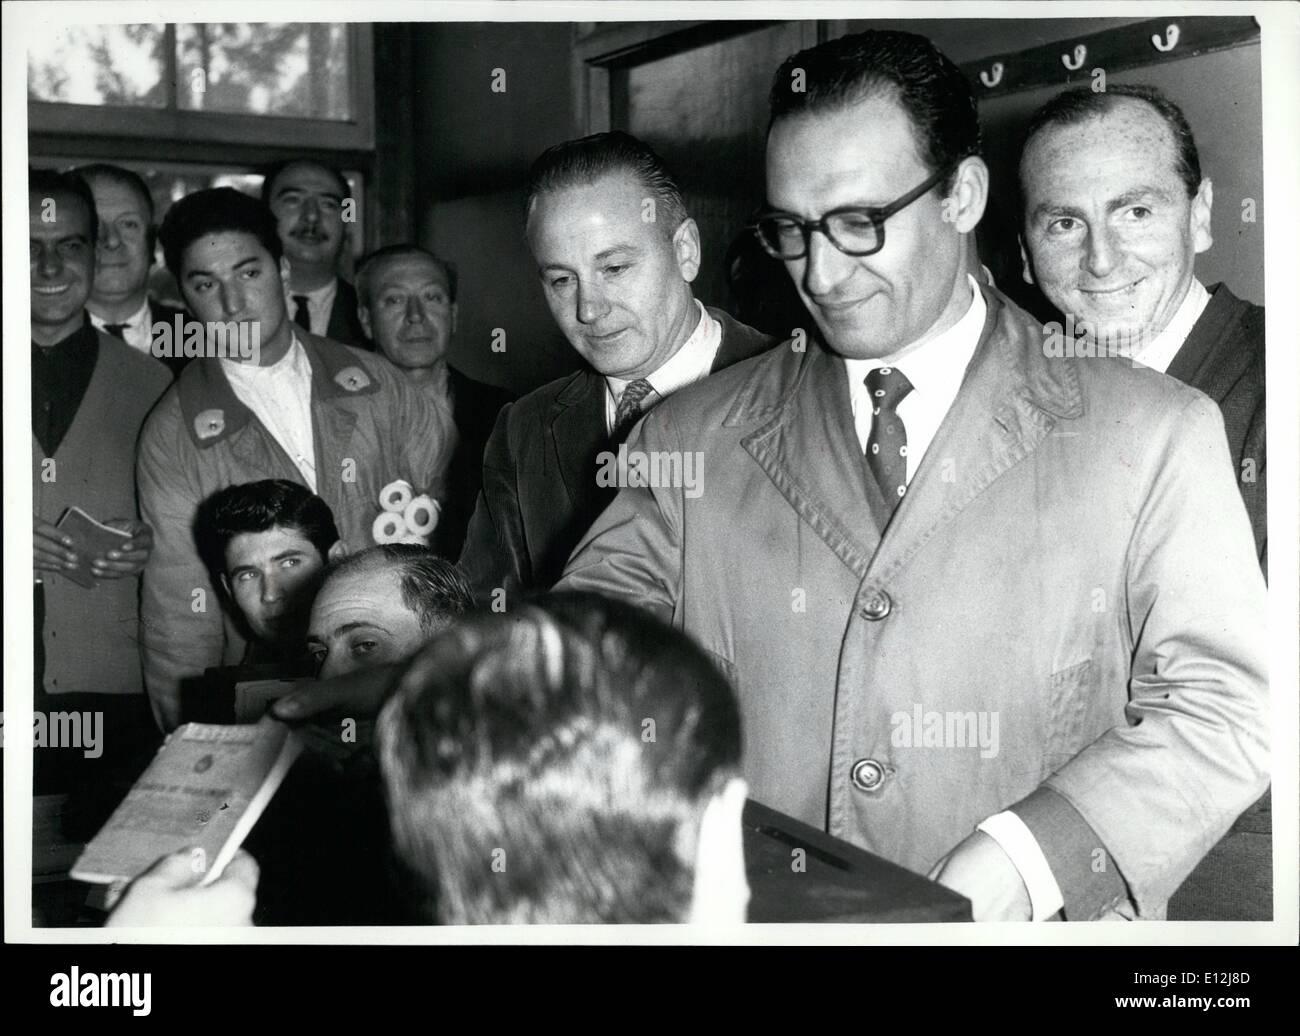 Feb. 24, 2012 - El Doctor Horaco Sueldo, candidate  Predident p  Democrats Crist taud. Stock Photo